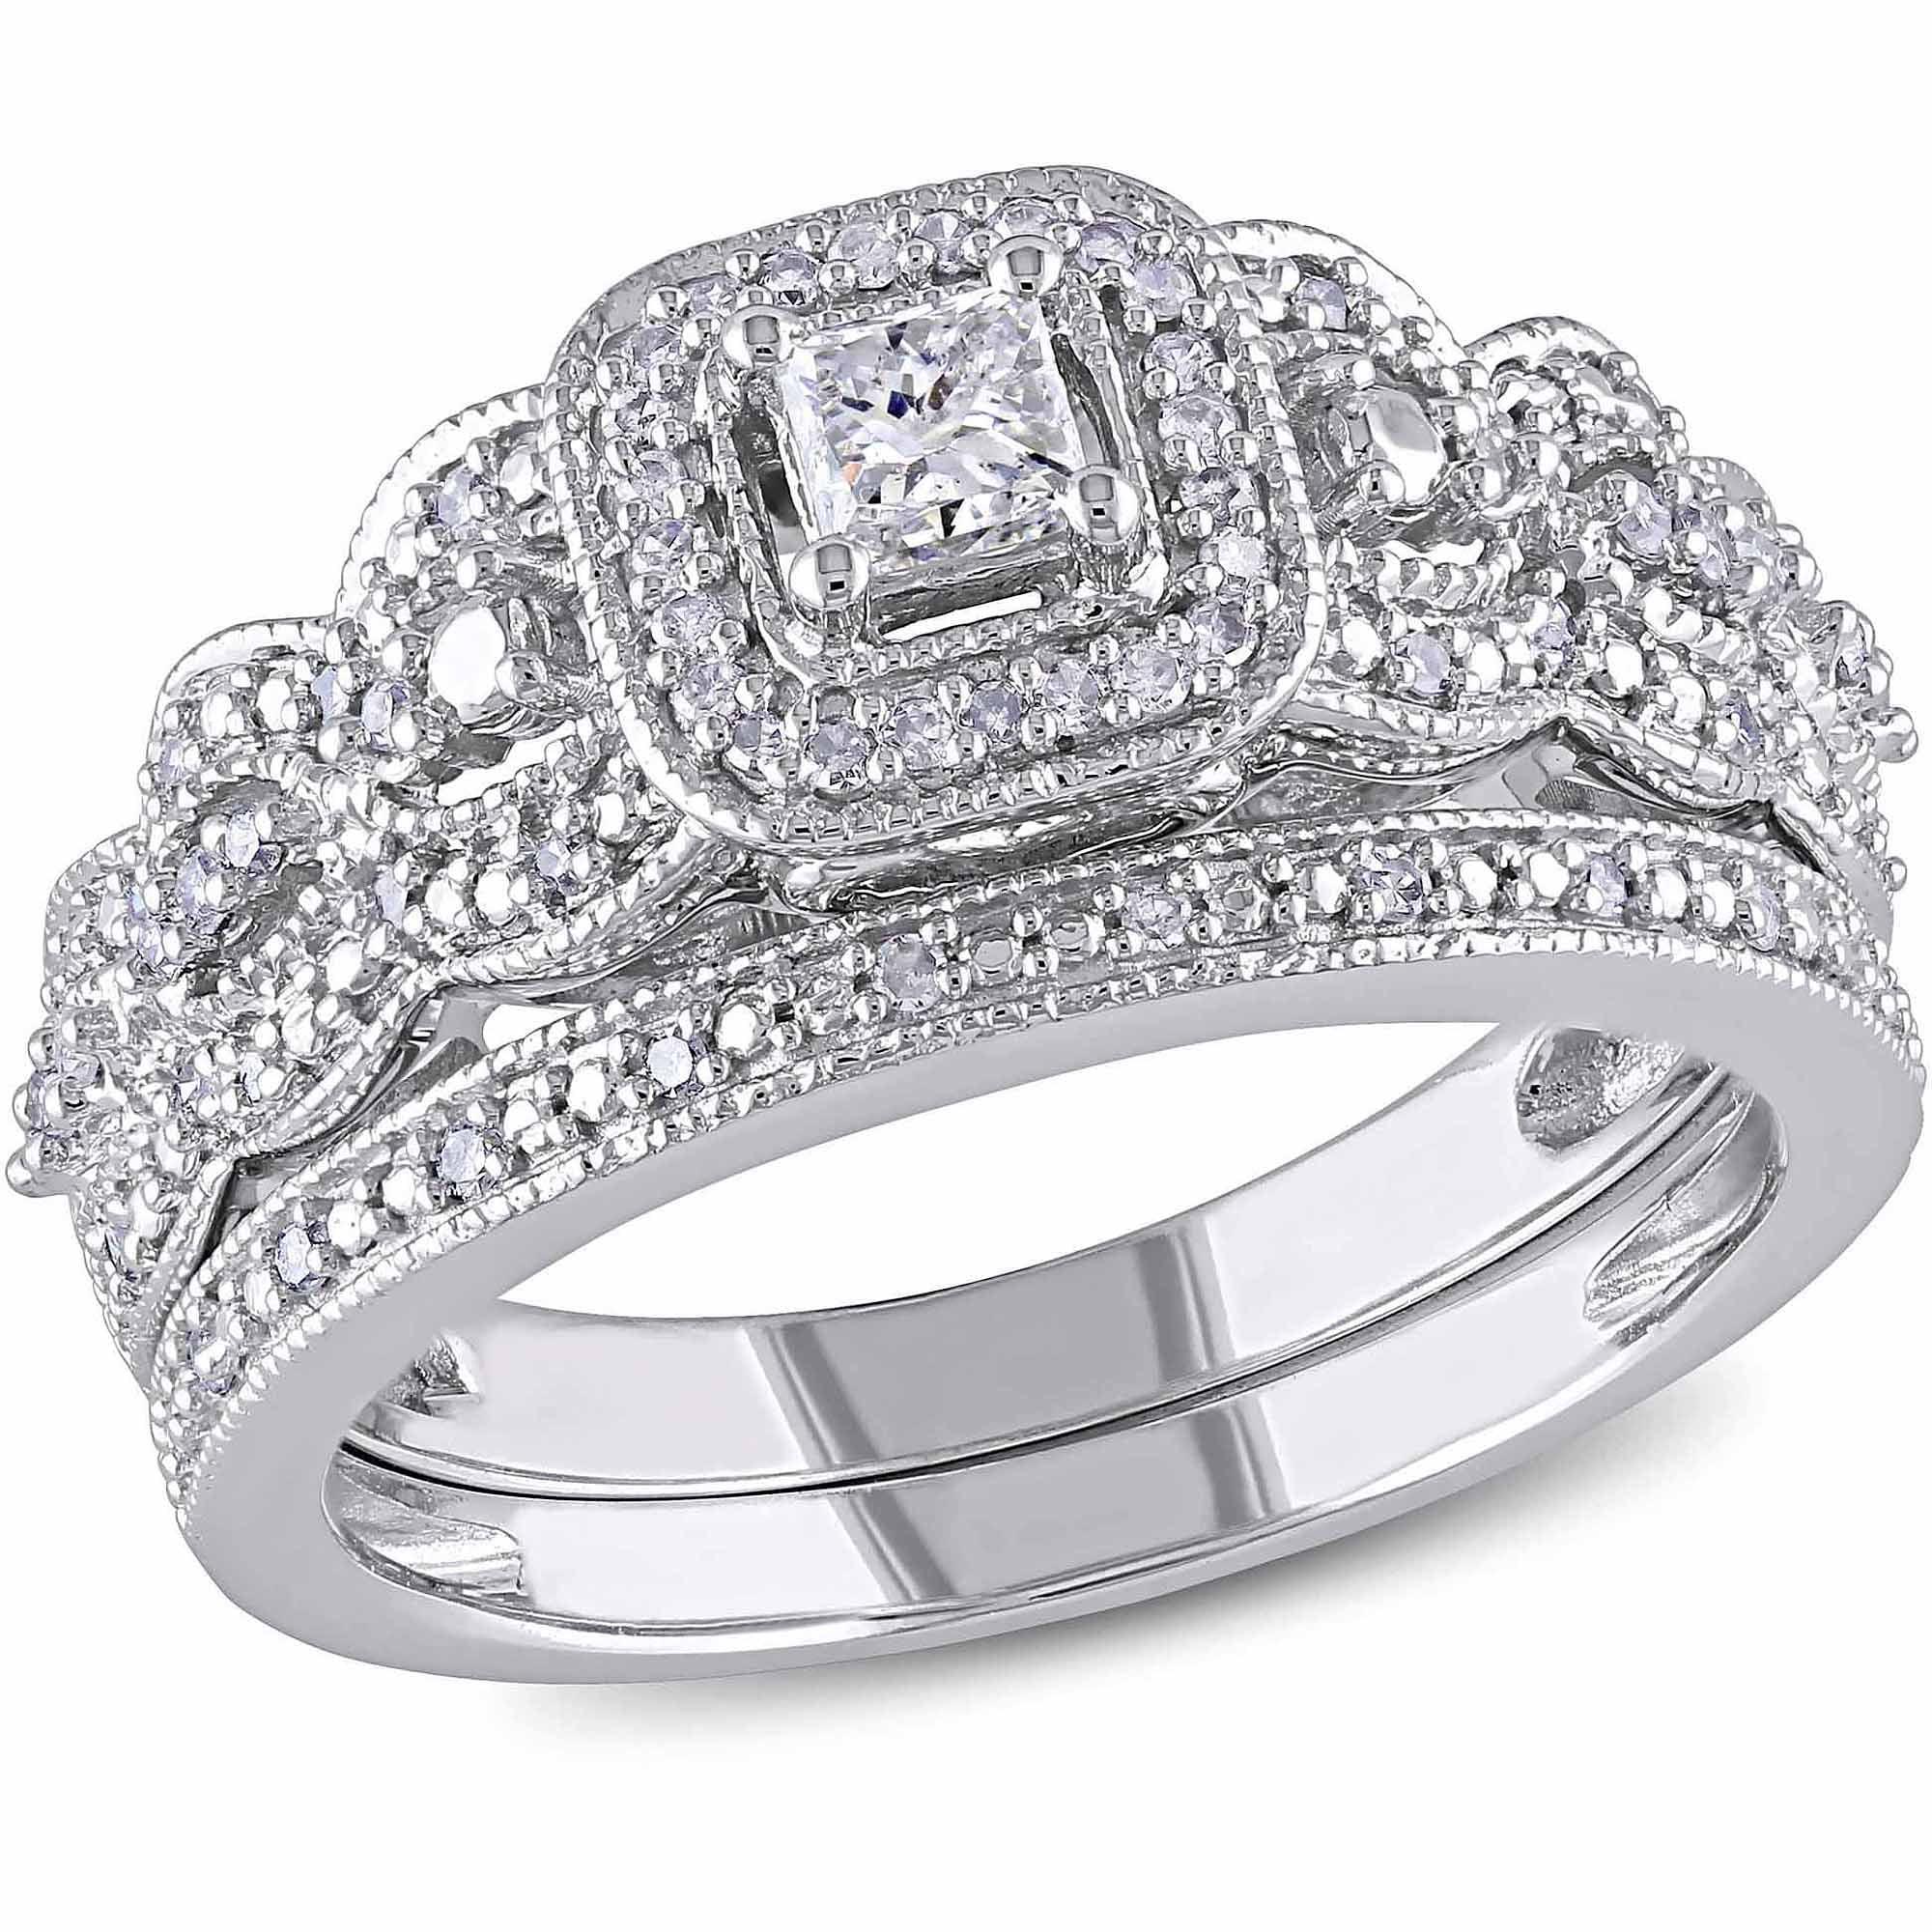 Miabella 1/2 Carat T.W. Princess and Round-Cut Diamond 14kt White Gold Bridal Set